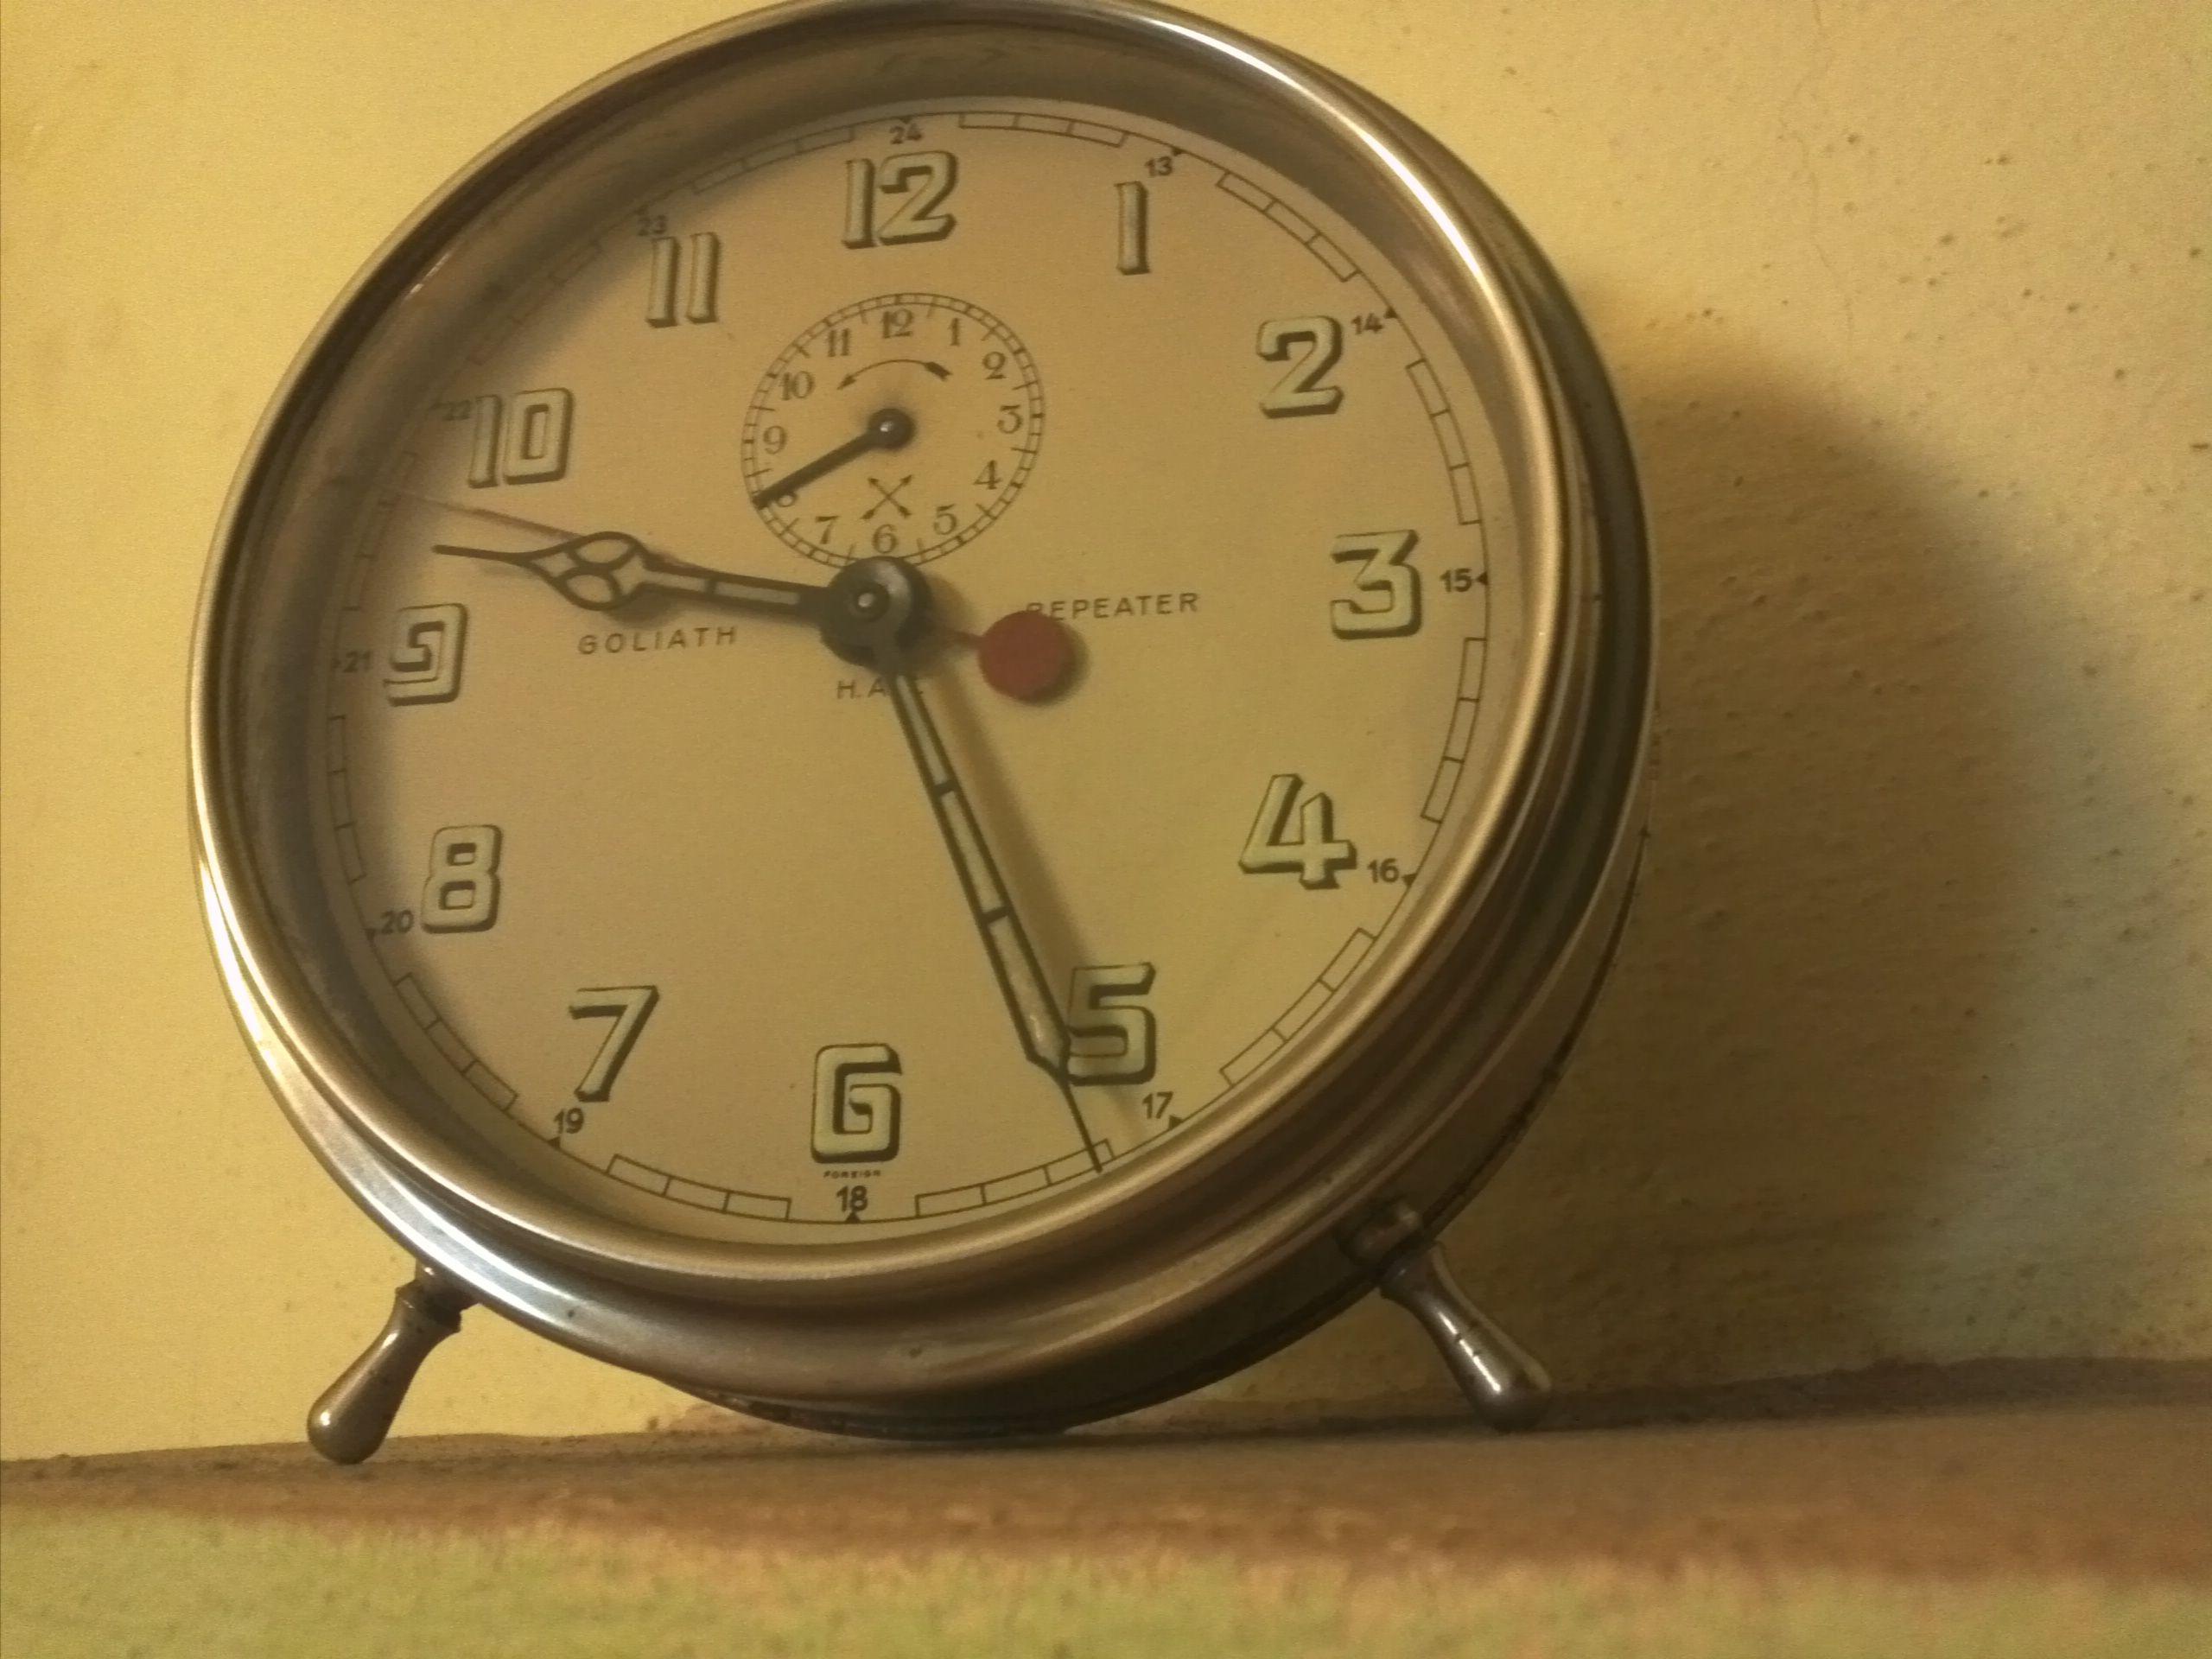 Hac goliath alarm clock junghans pinterest alarm clocks hac goliath alarm clock amipublicfo Choice Image